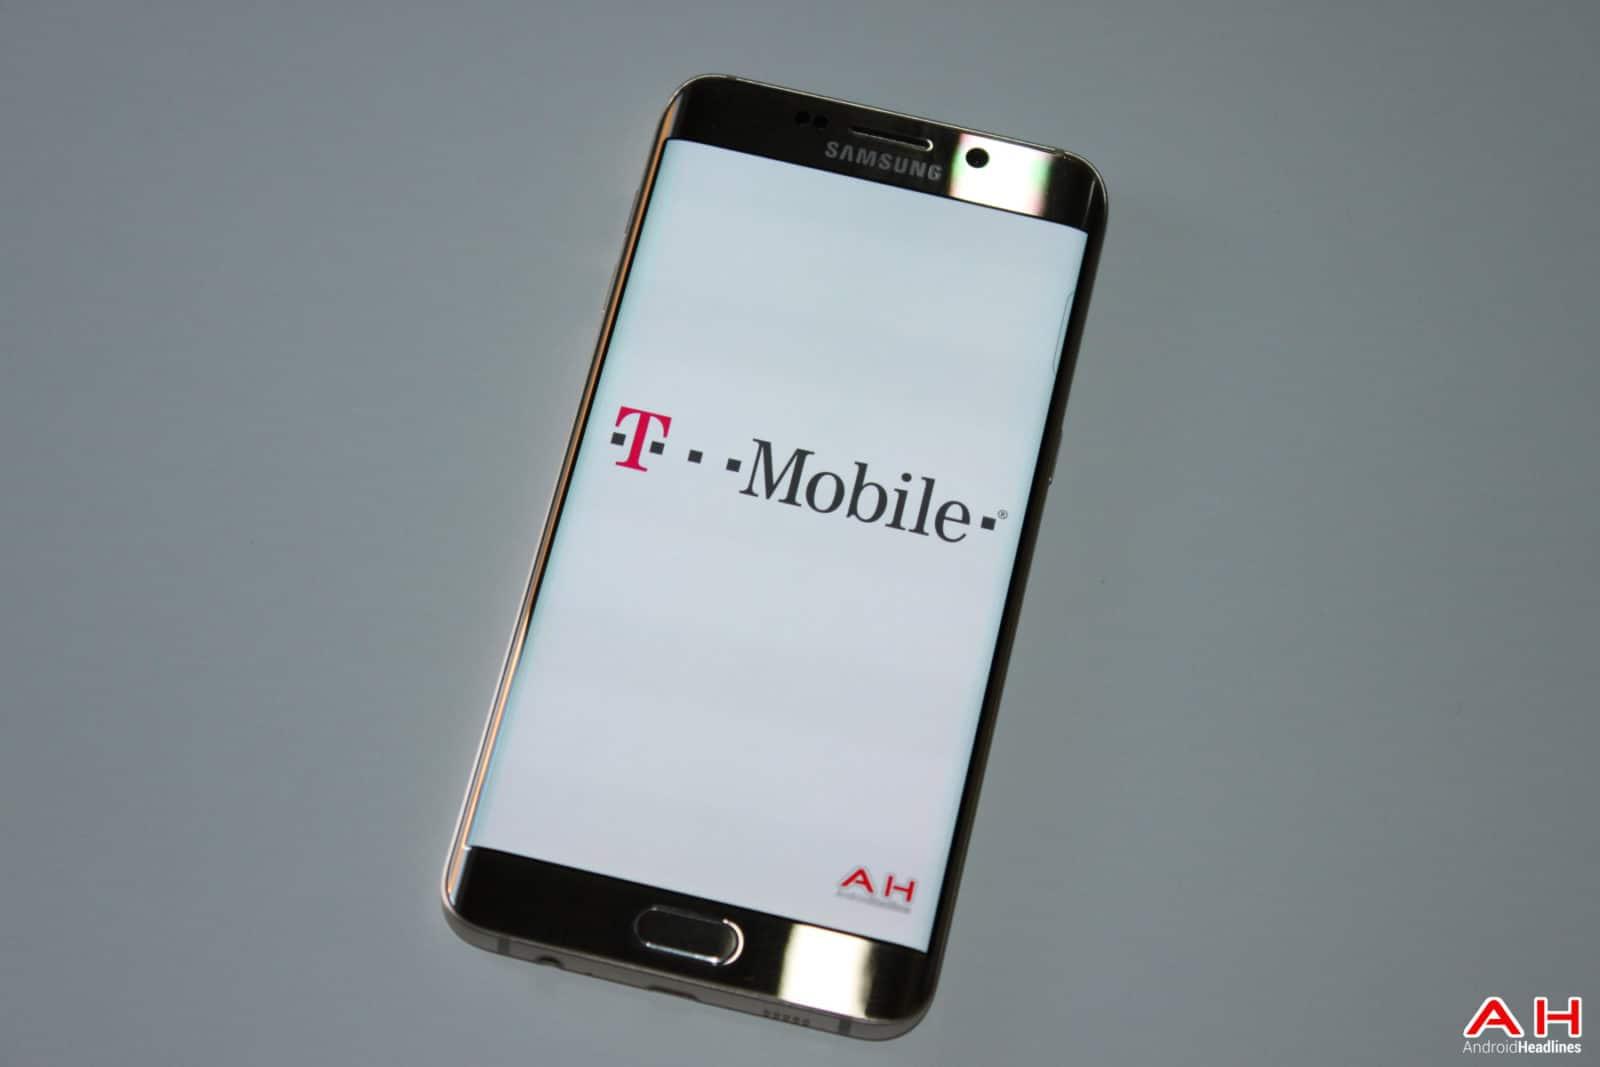 AH 2015 T-Mobile TMO LOGO-20